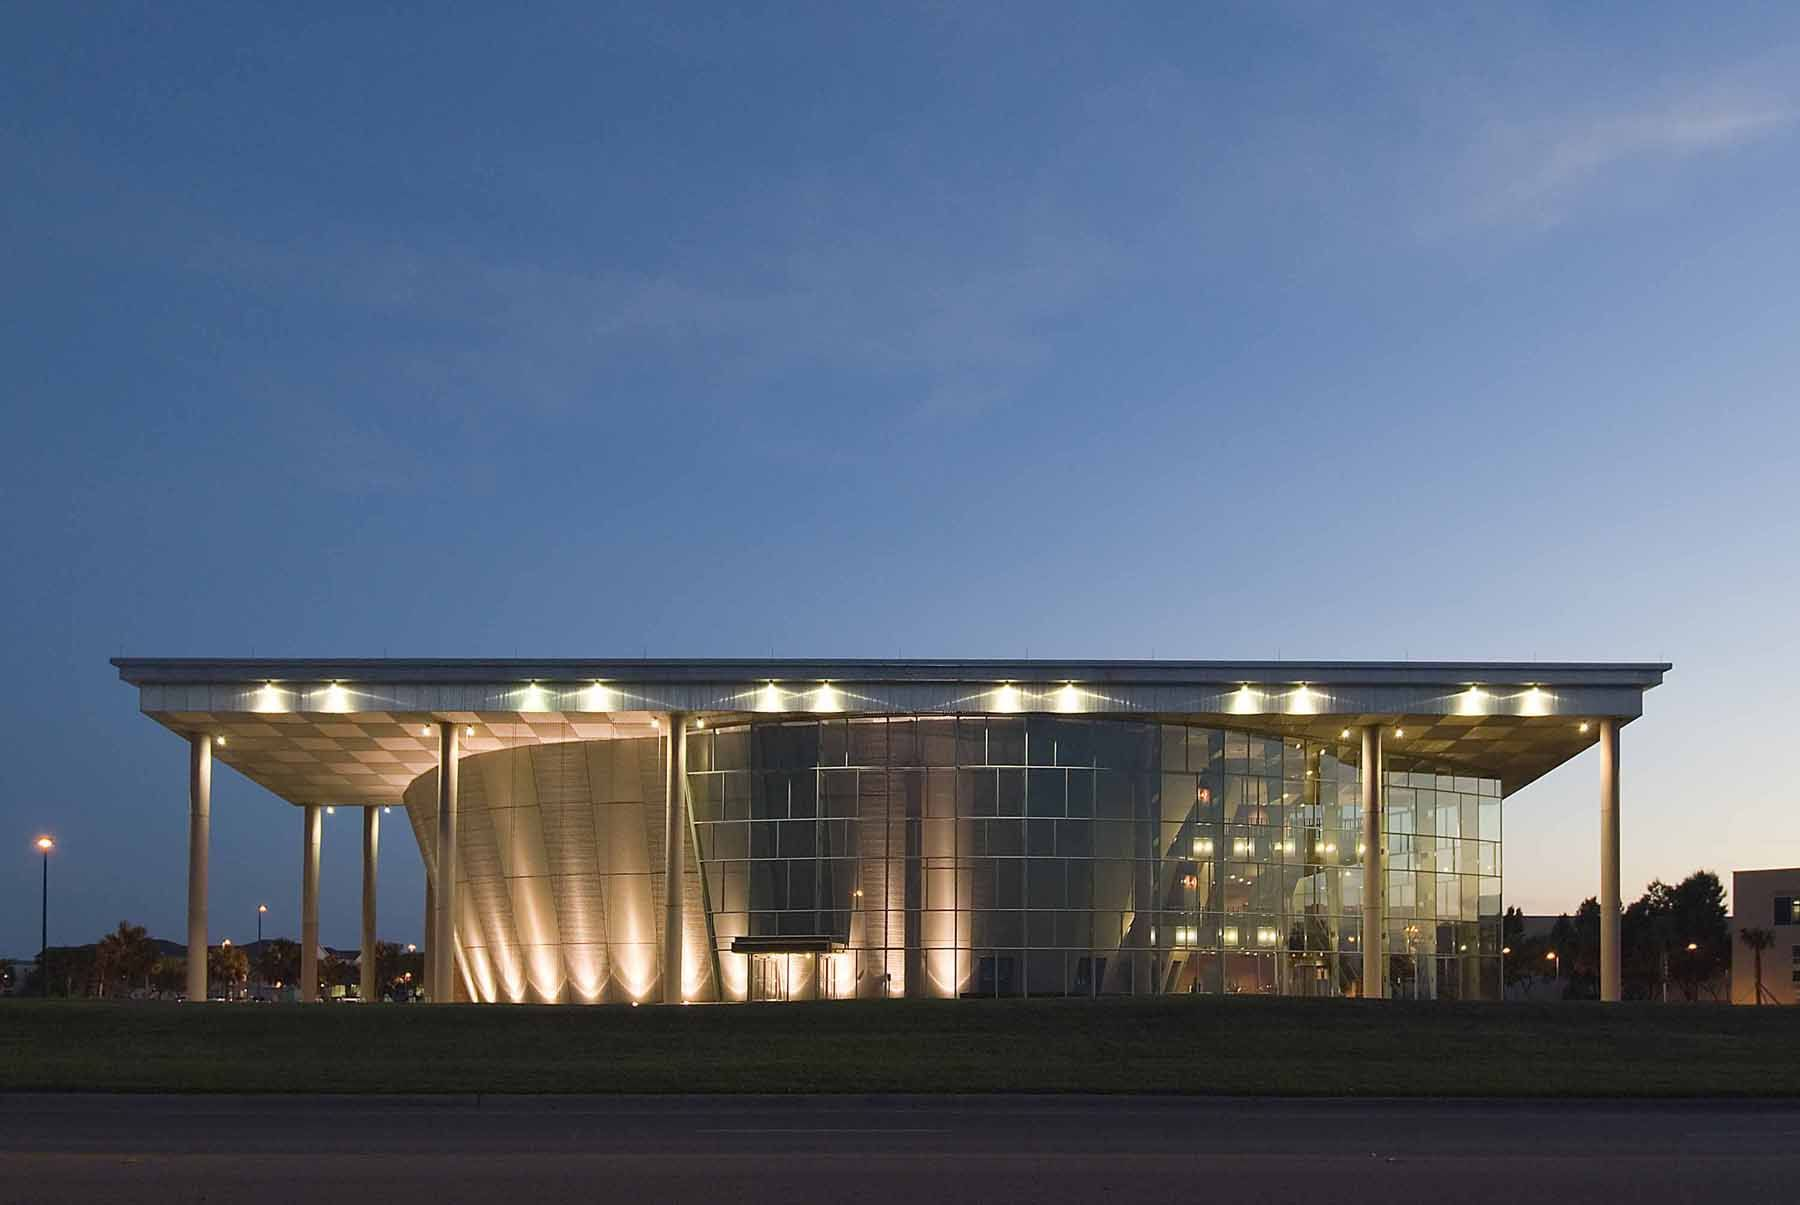 Texas A&M University Corpus Christi, Performing Arts